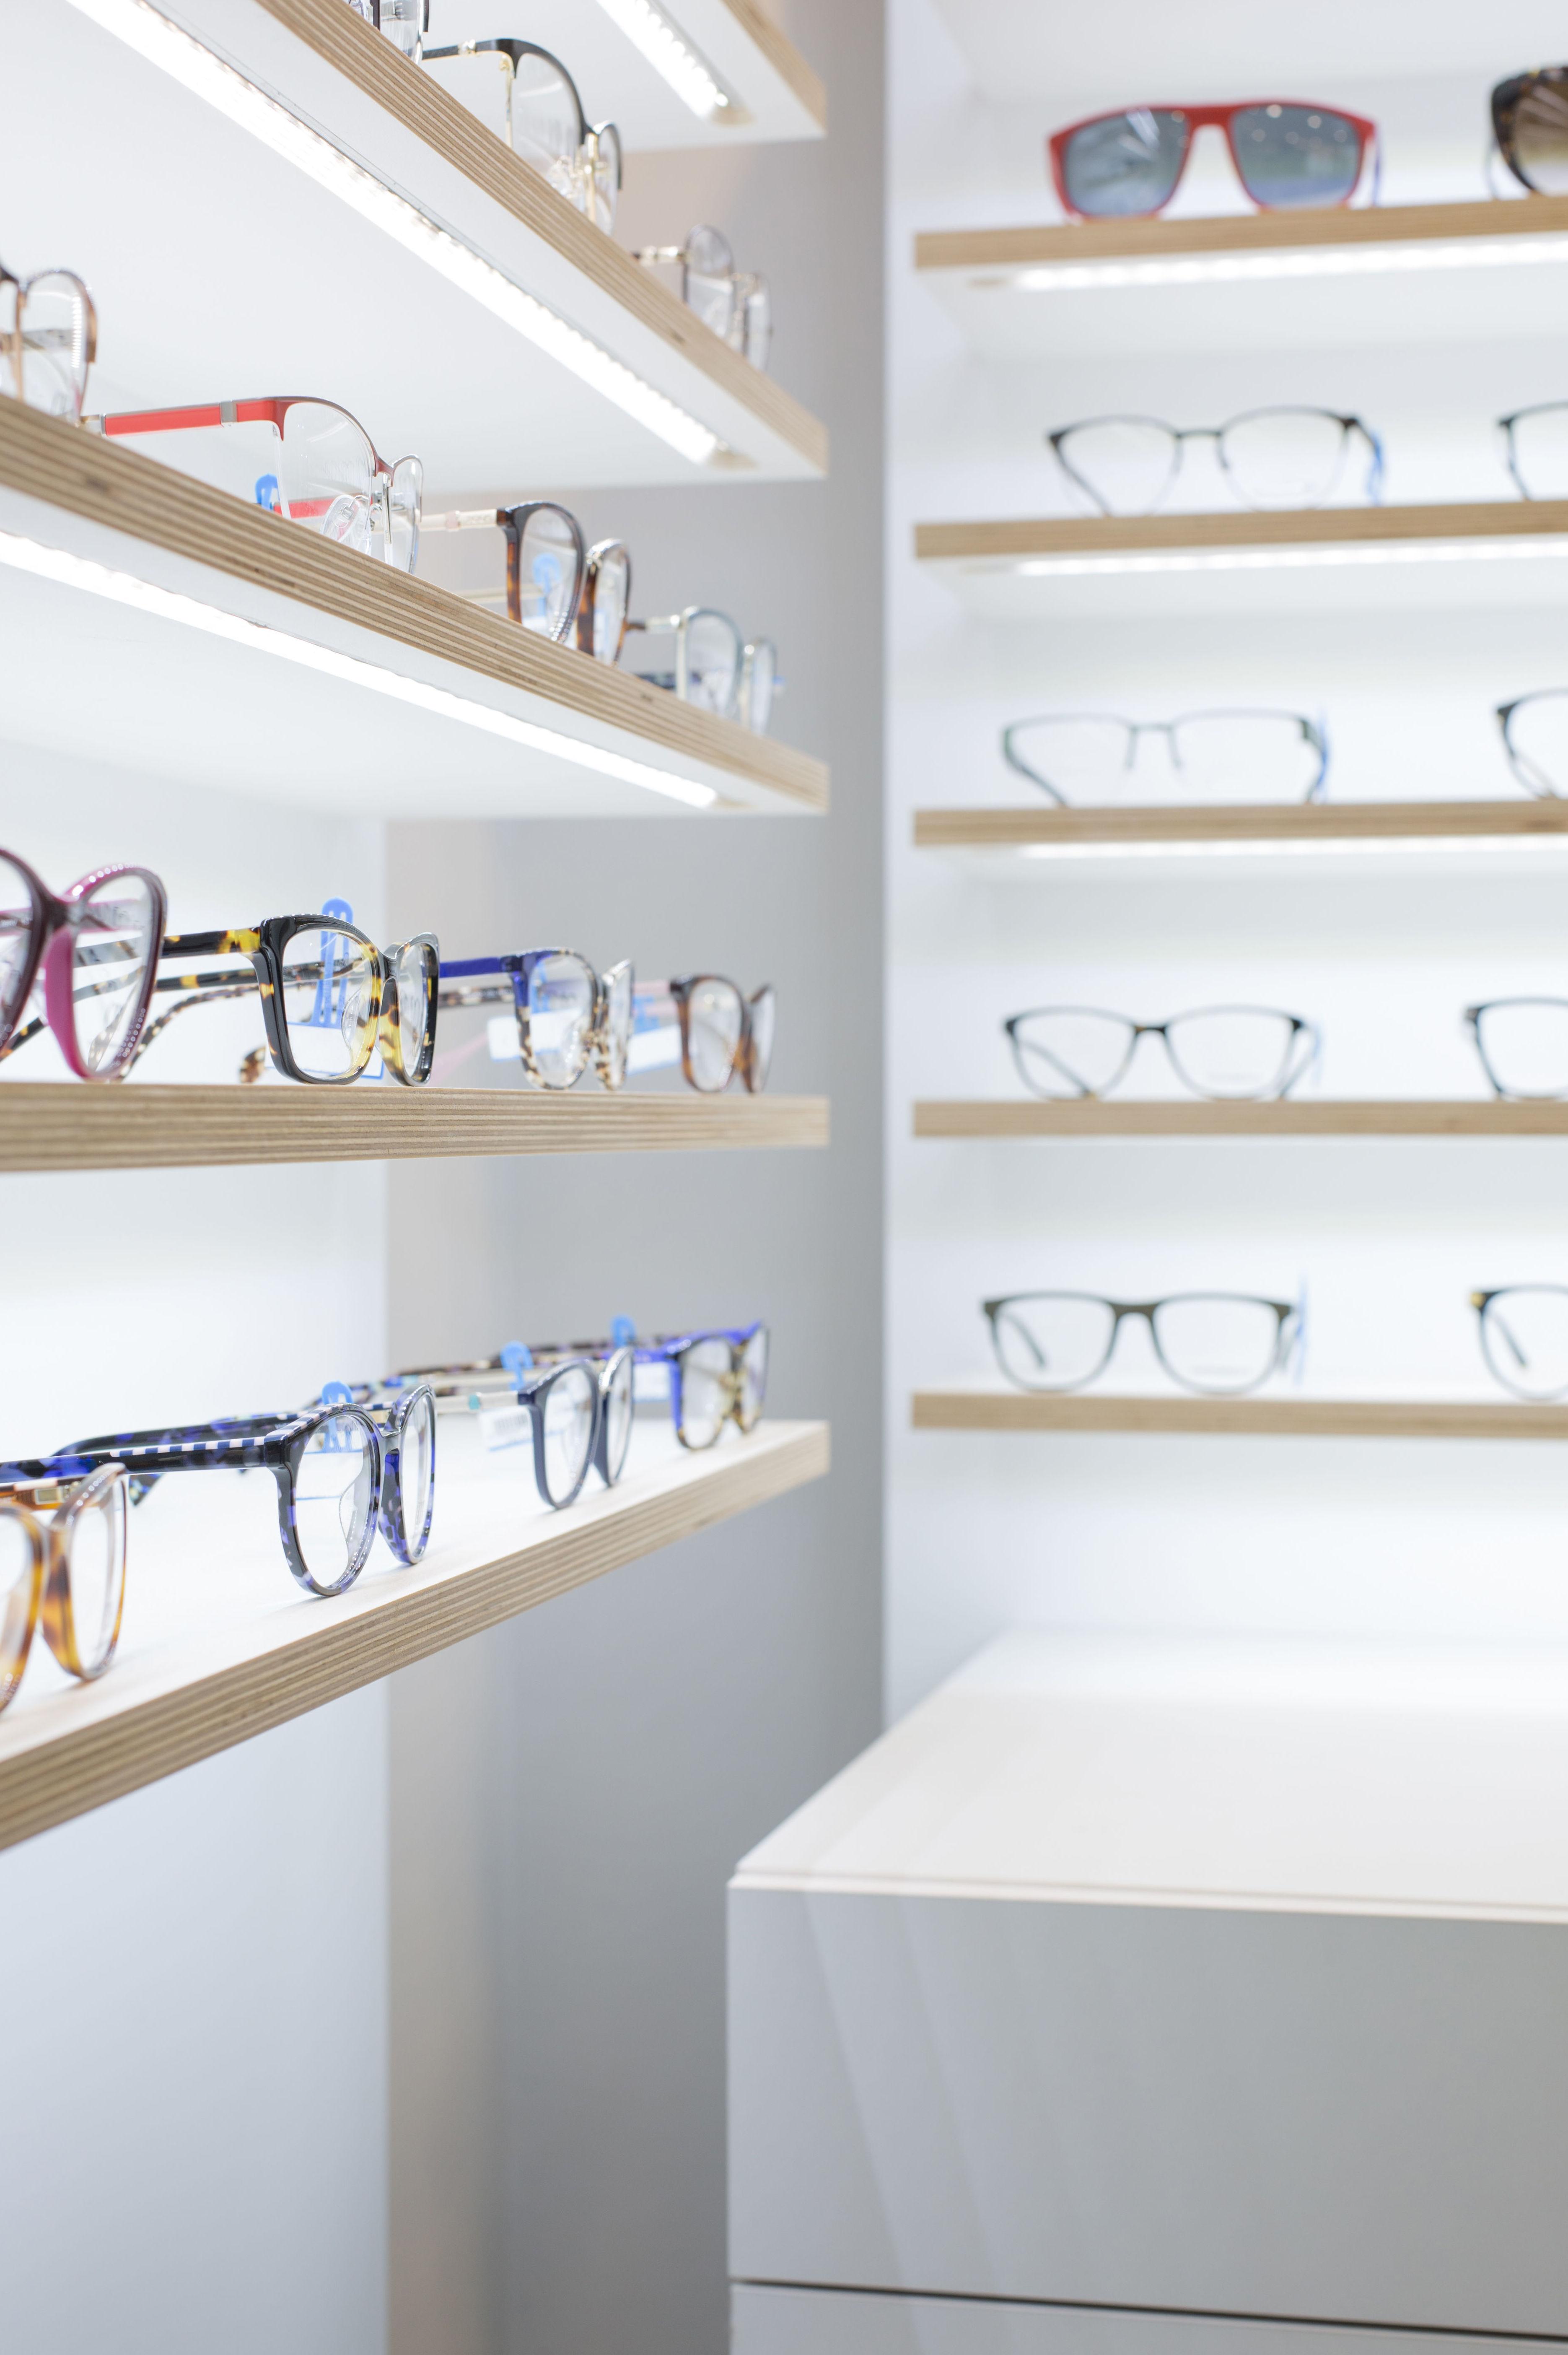 Opticalia Ávila, tenemos las mejores marcas para ti